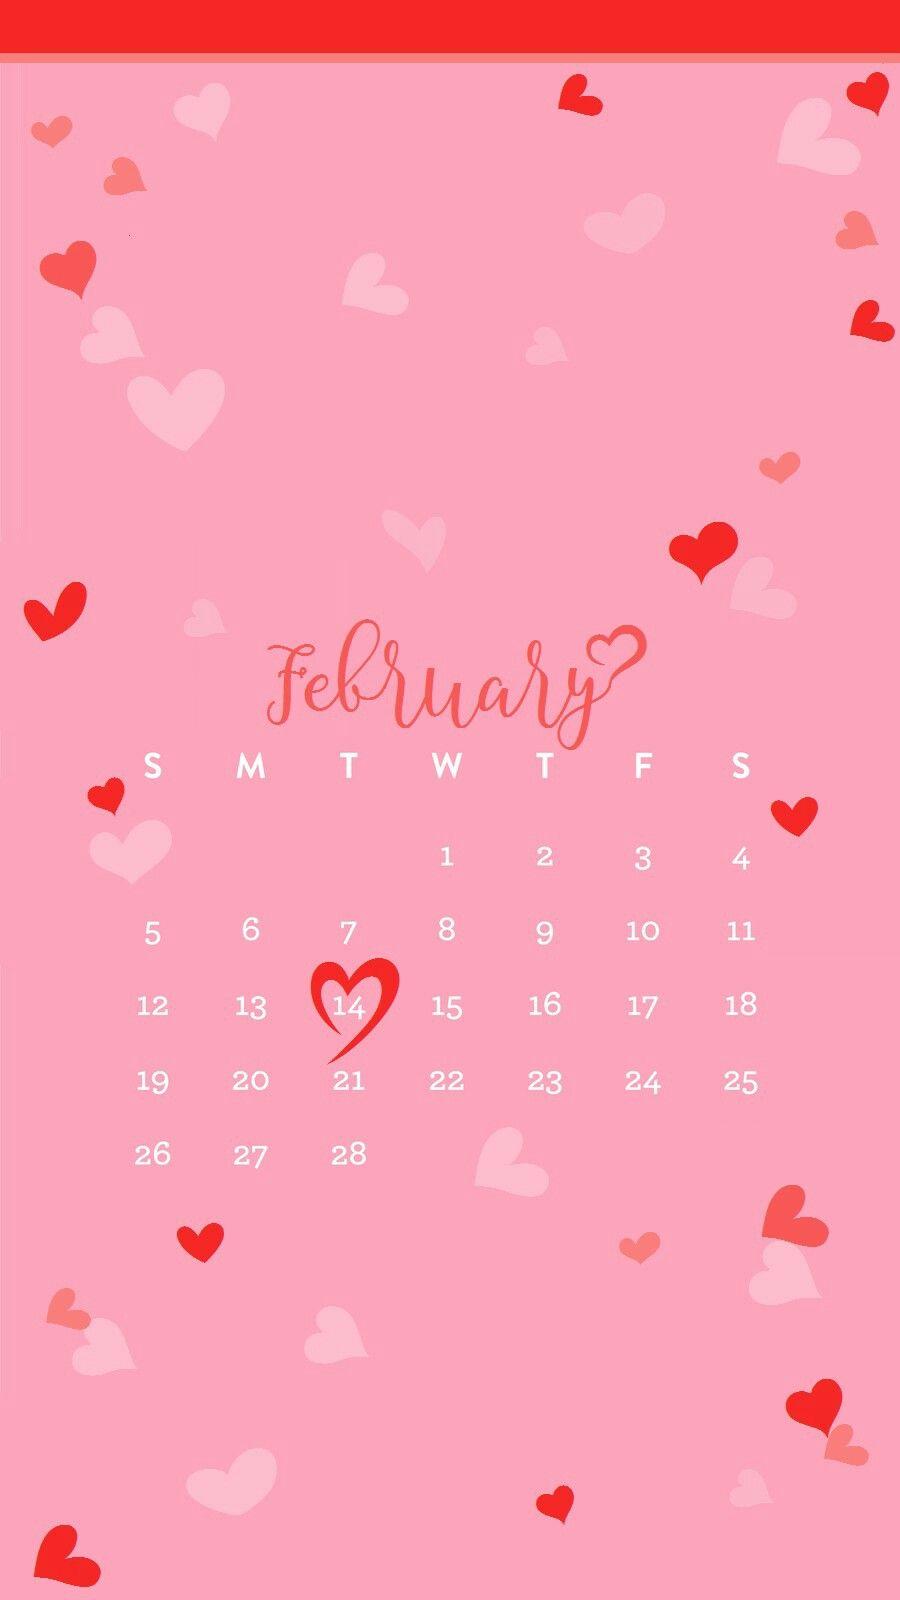 Download Wallpaper Hello Kitty Calendar - 5c5027b324260fb6ed1f5bff1dc2ca16  Picture_46484.jpg